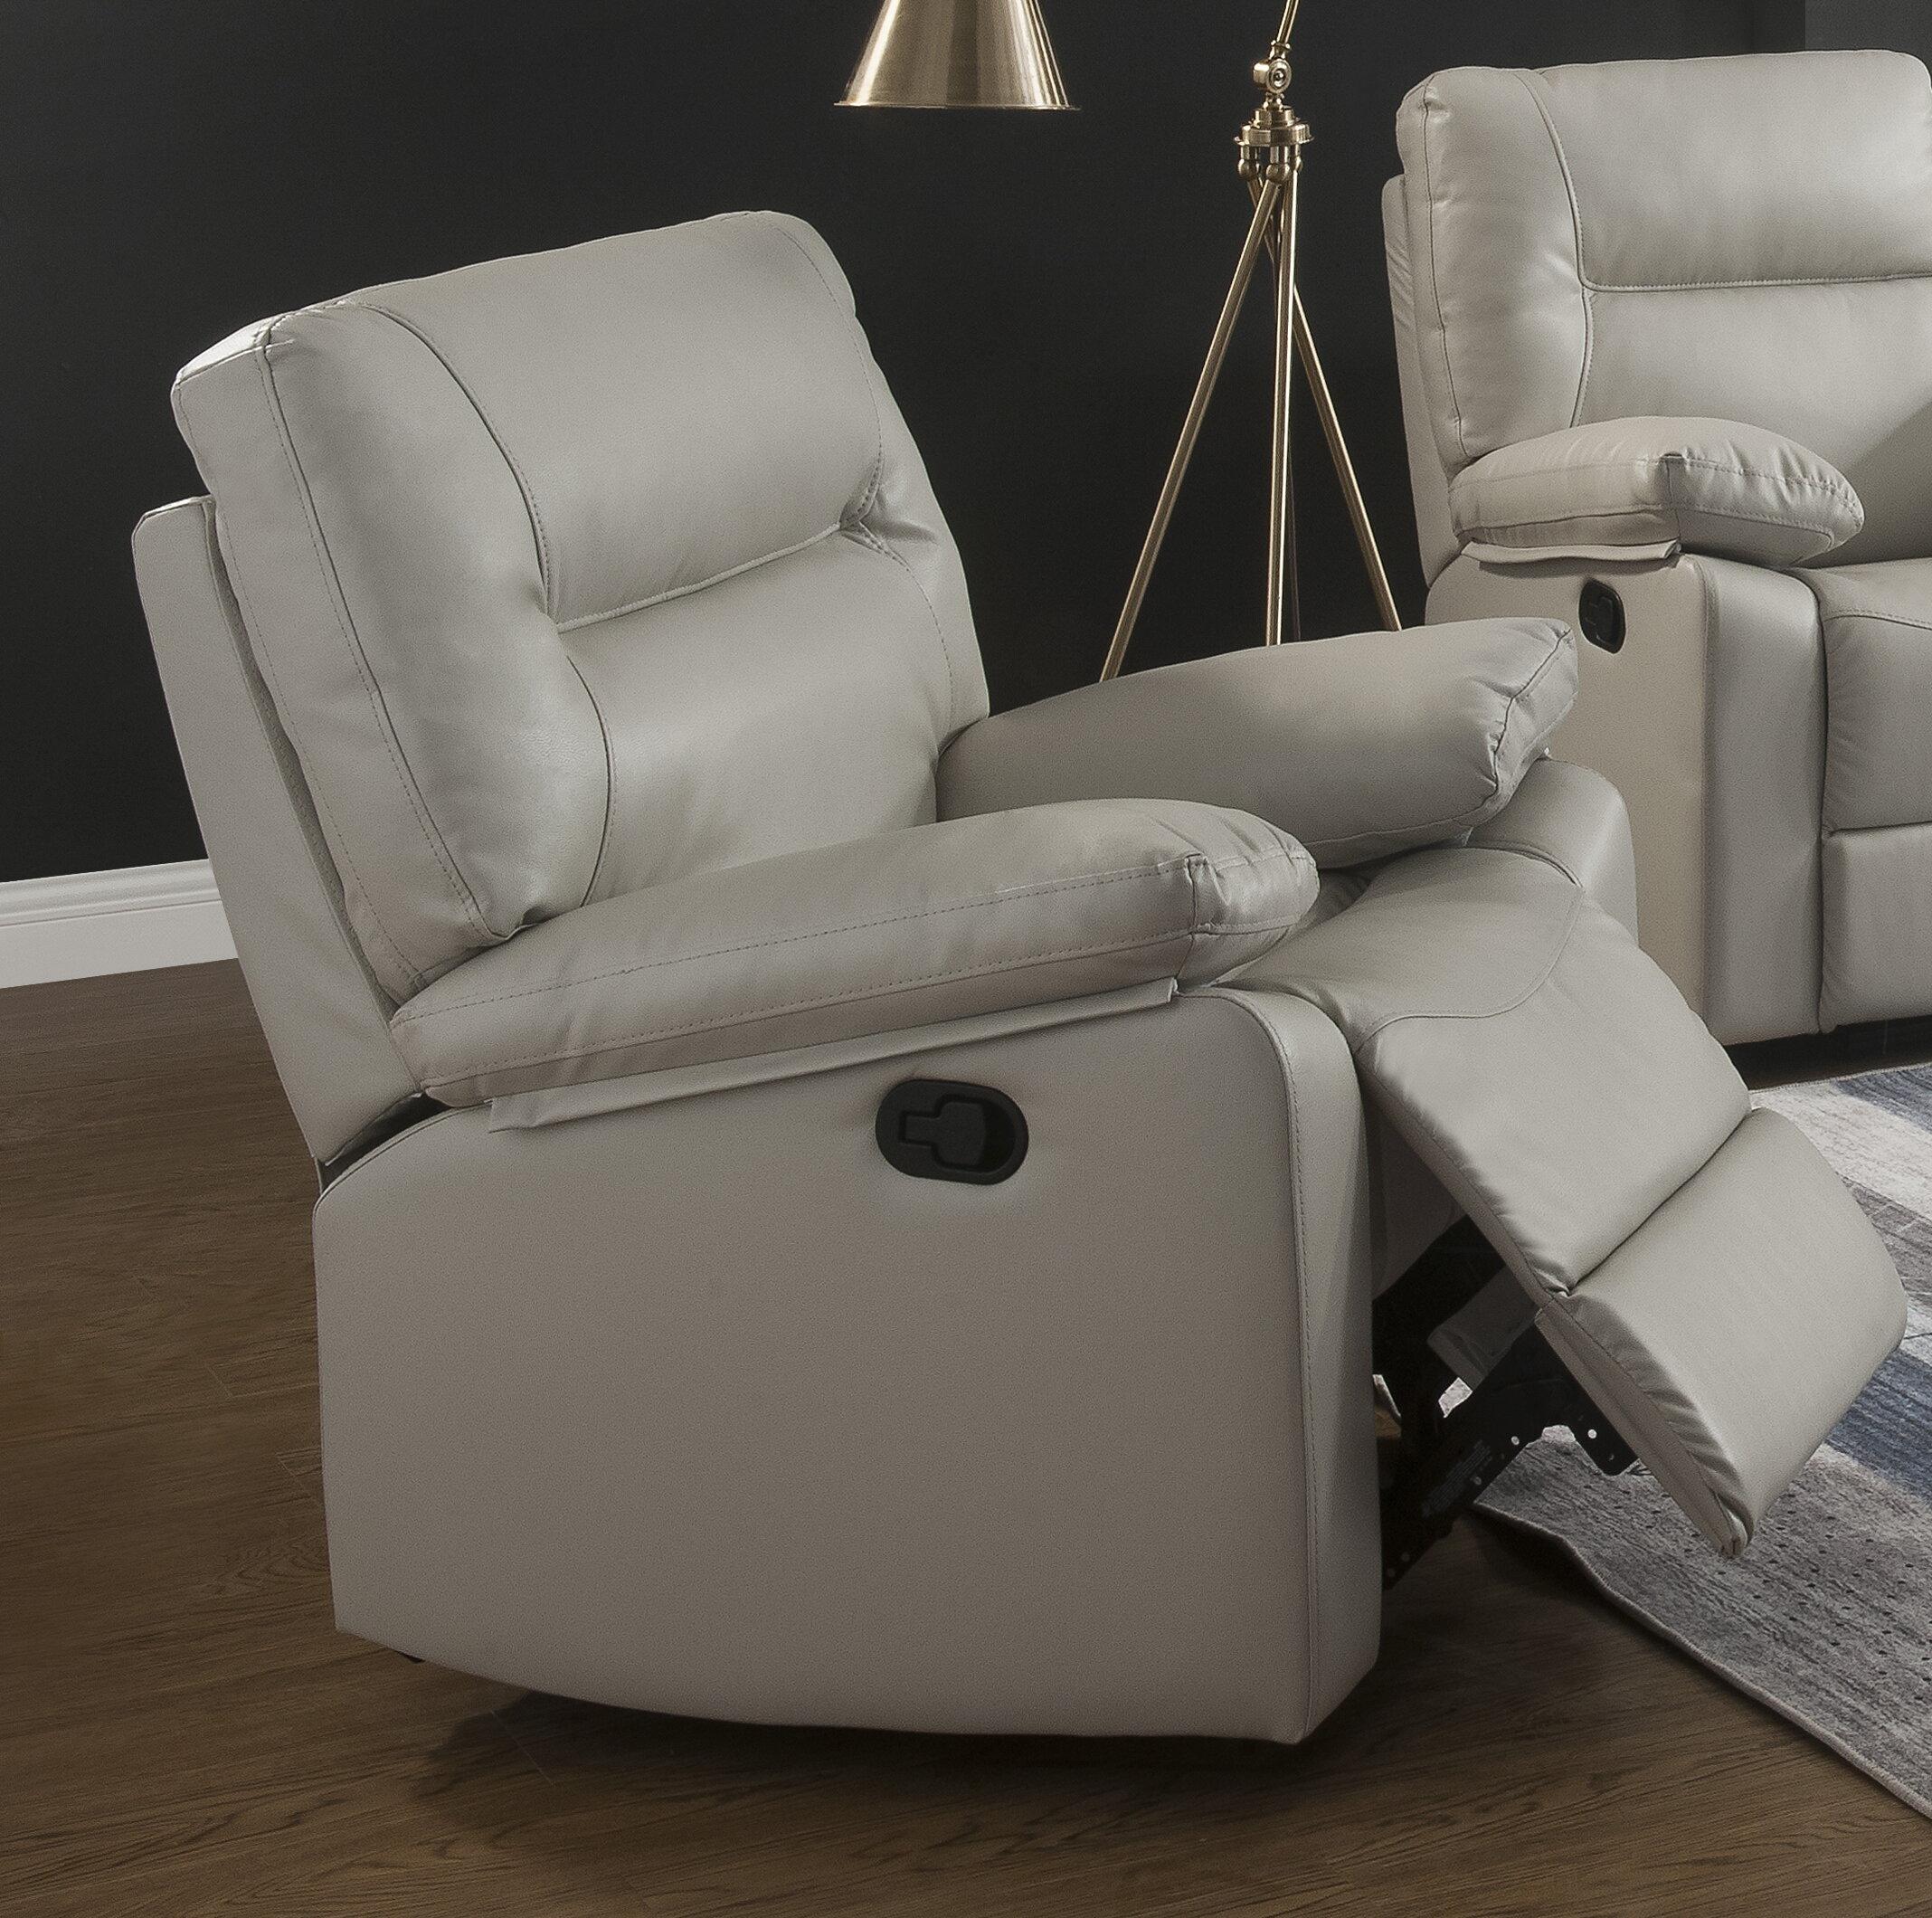 Marvelous Larrabee Manual Rocker Recliner Machost Co Dining Chair Design Ideas Machostcouk